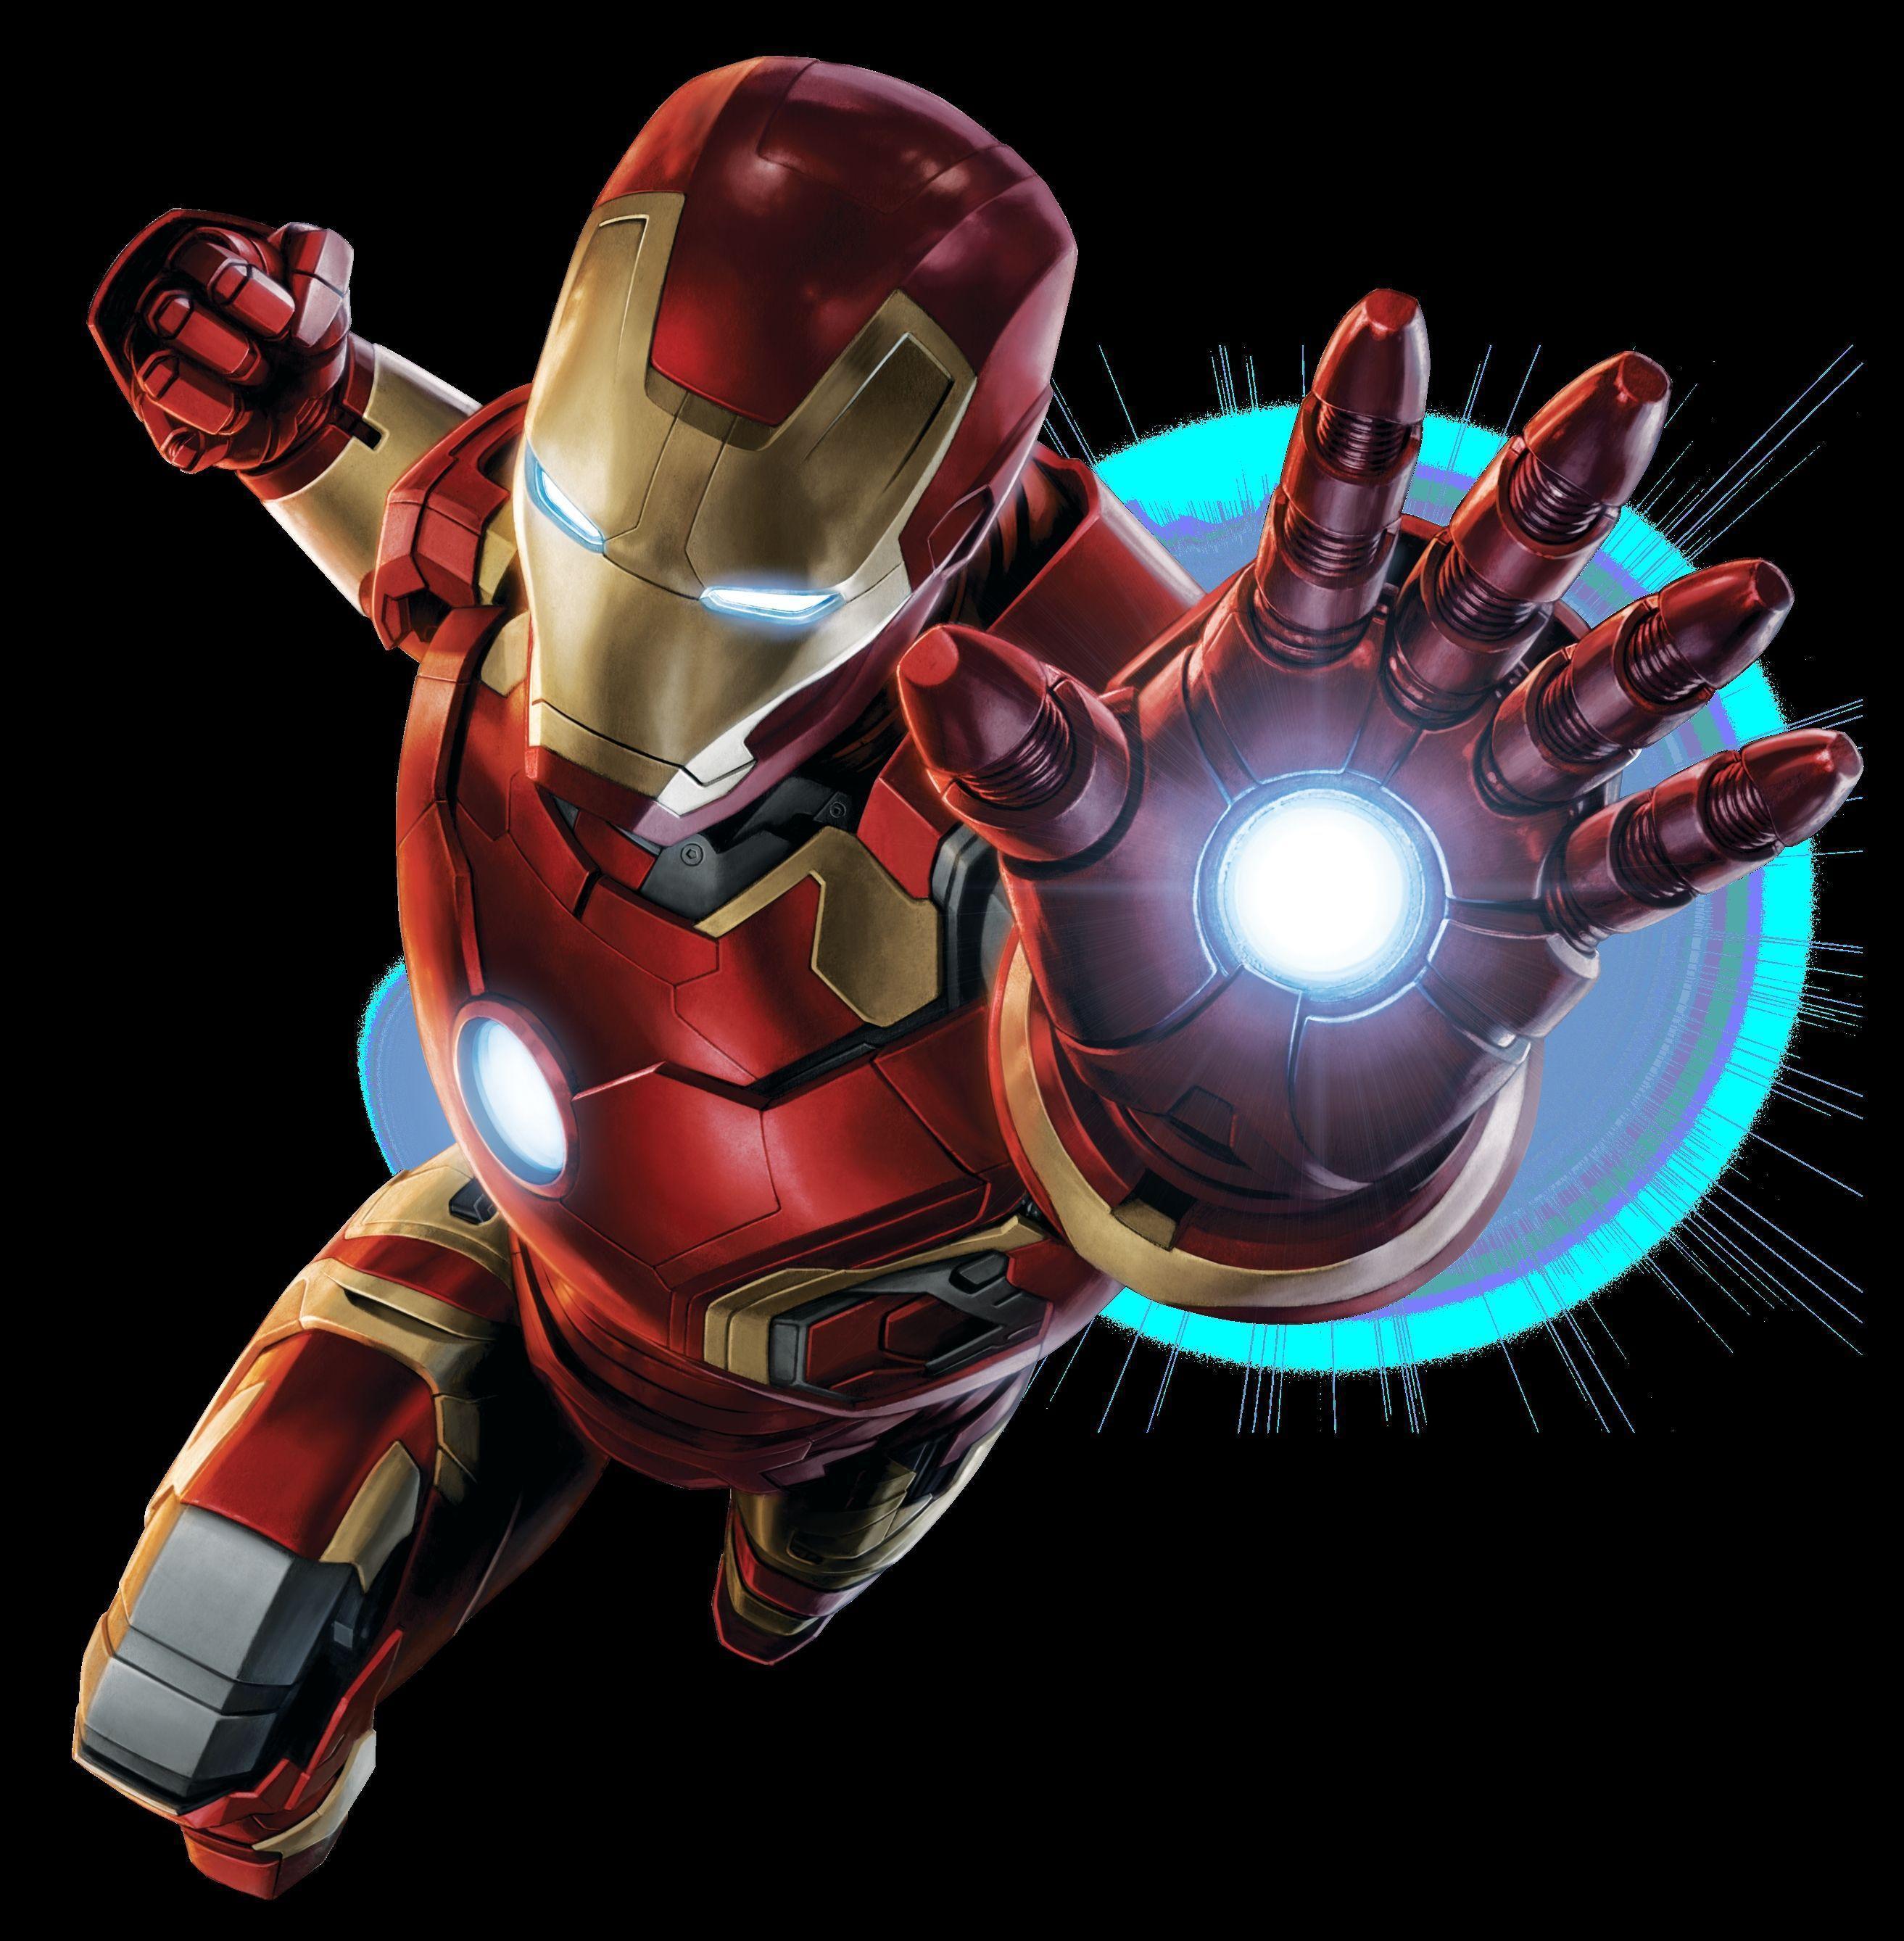 Iron Man 4 Wallpapers Top Free Iron Man 4 Backgrounds Wallpaperaccess